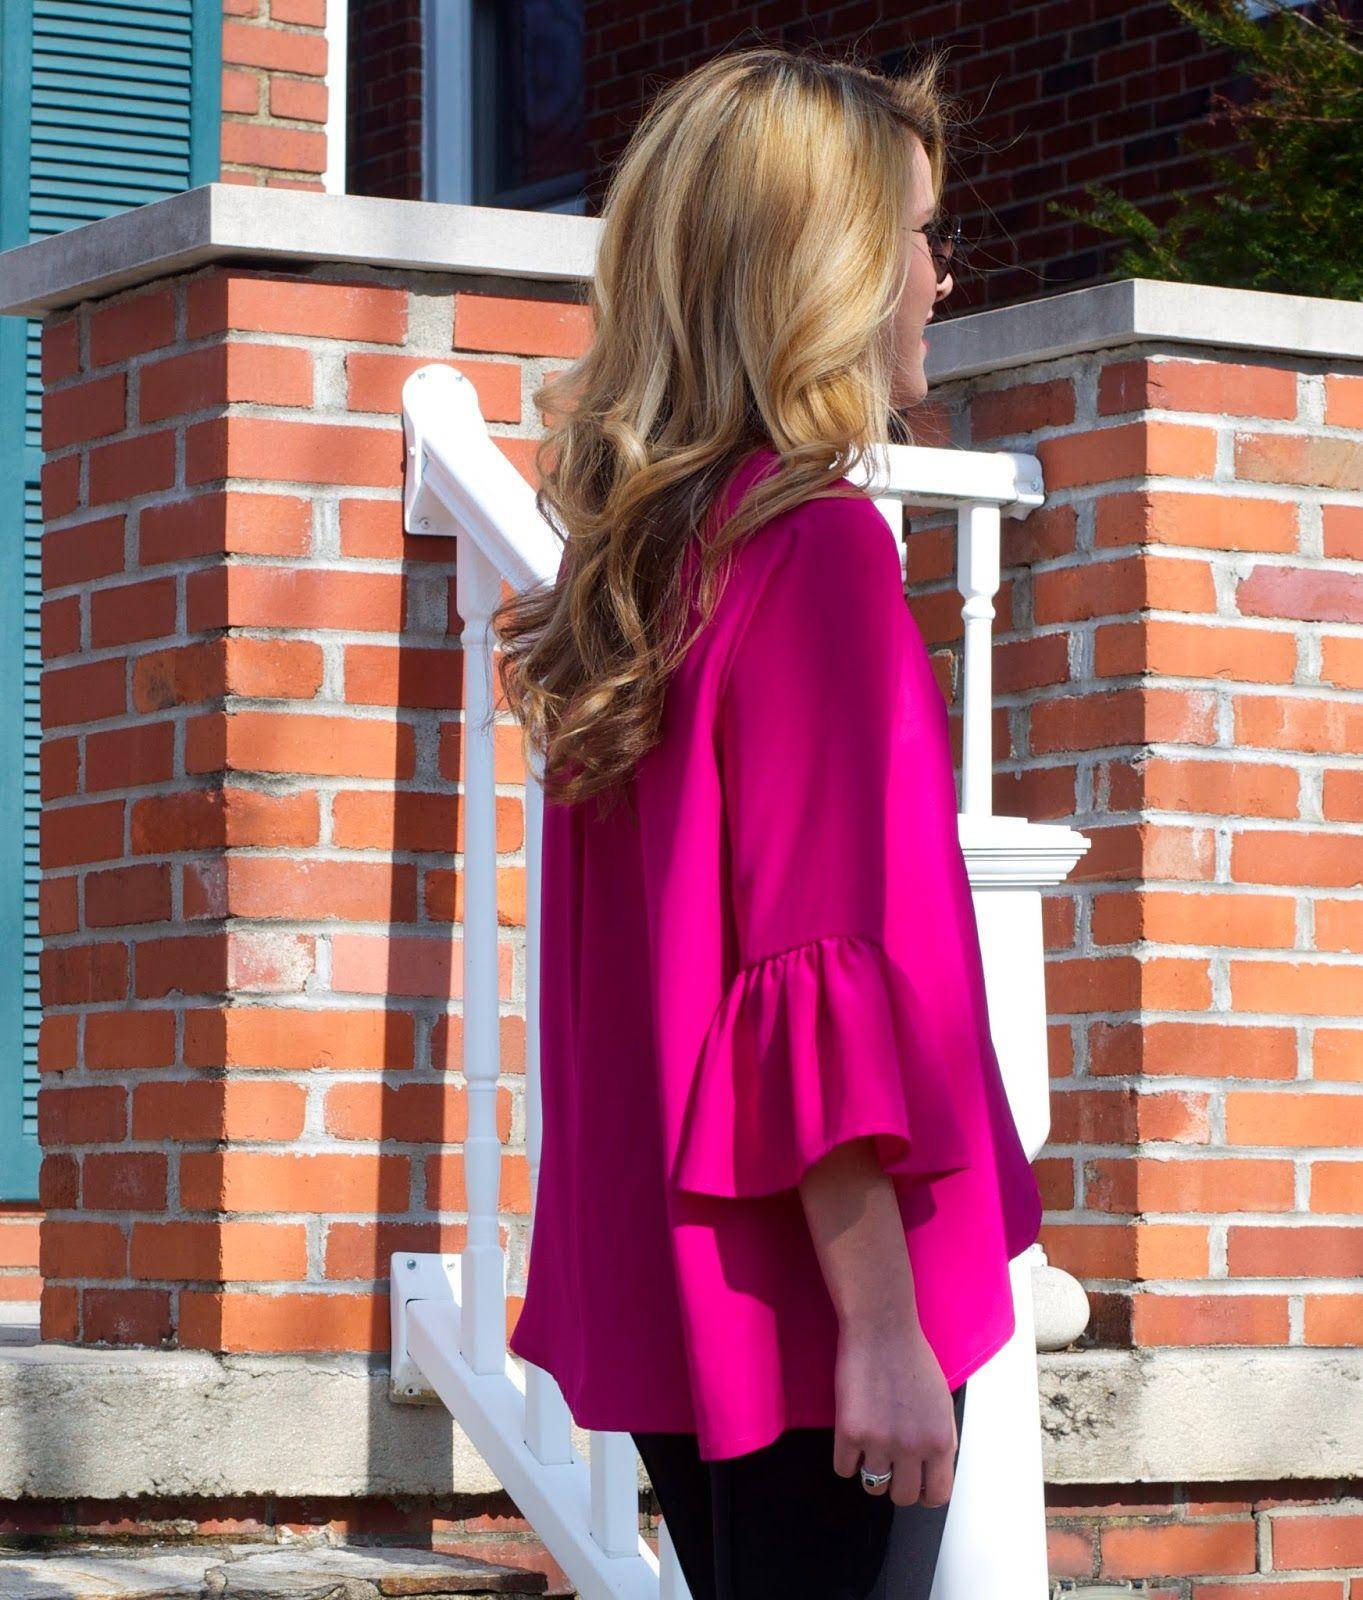 Summer Wind | FaShIoN!sT | Pinterest | Venta ropa, Ventas y Blusas